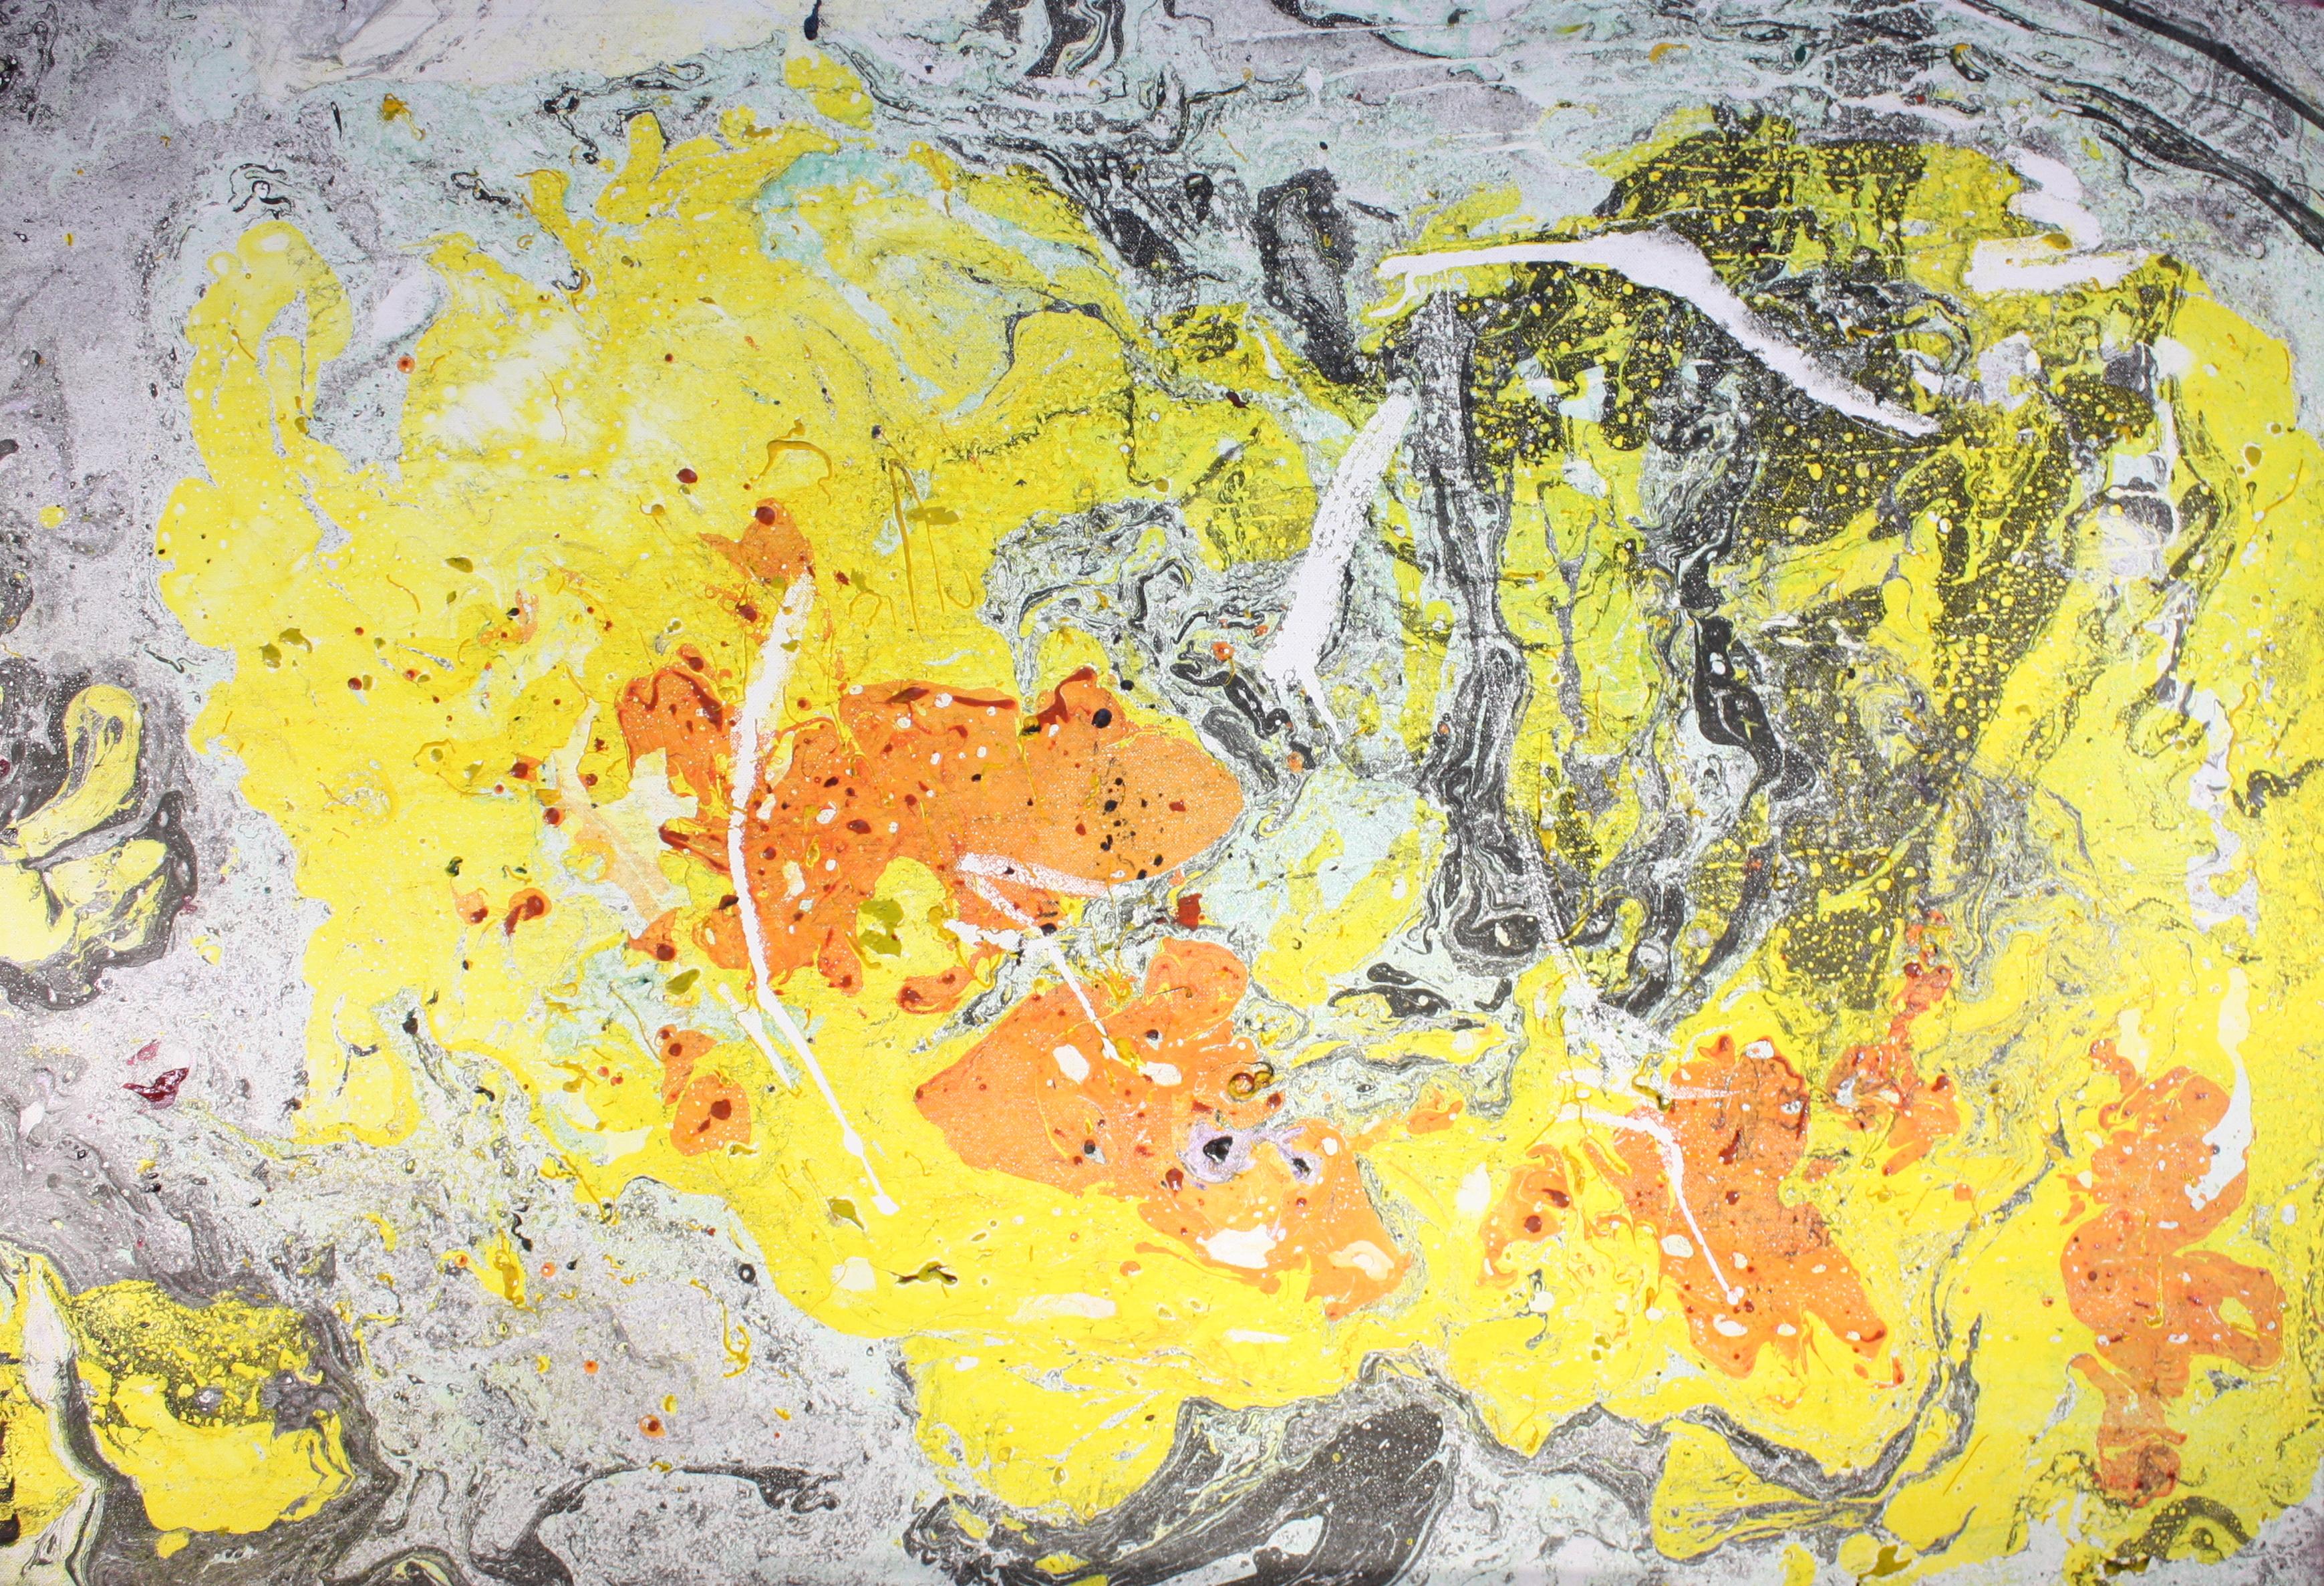 49 painting 70x100 (8)